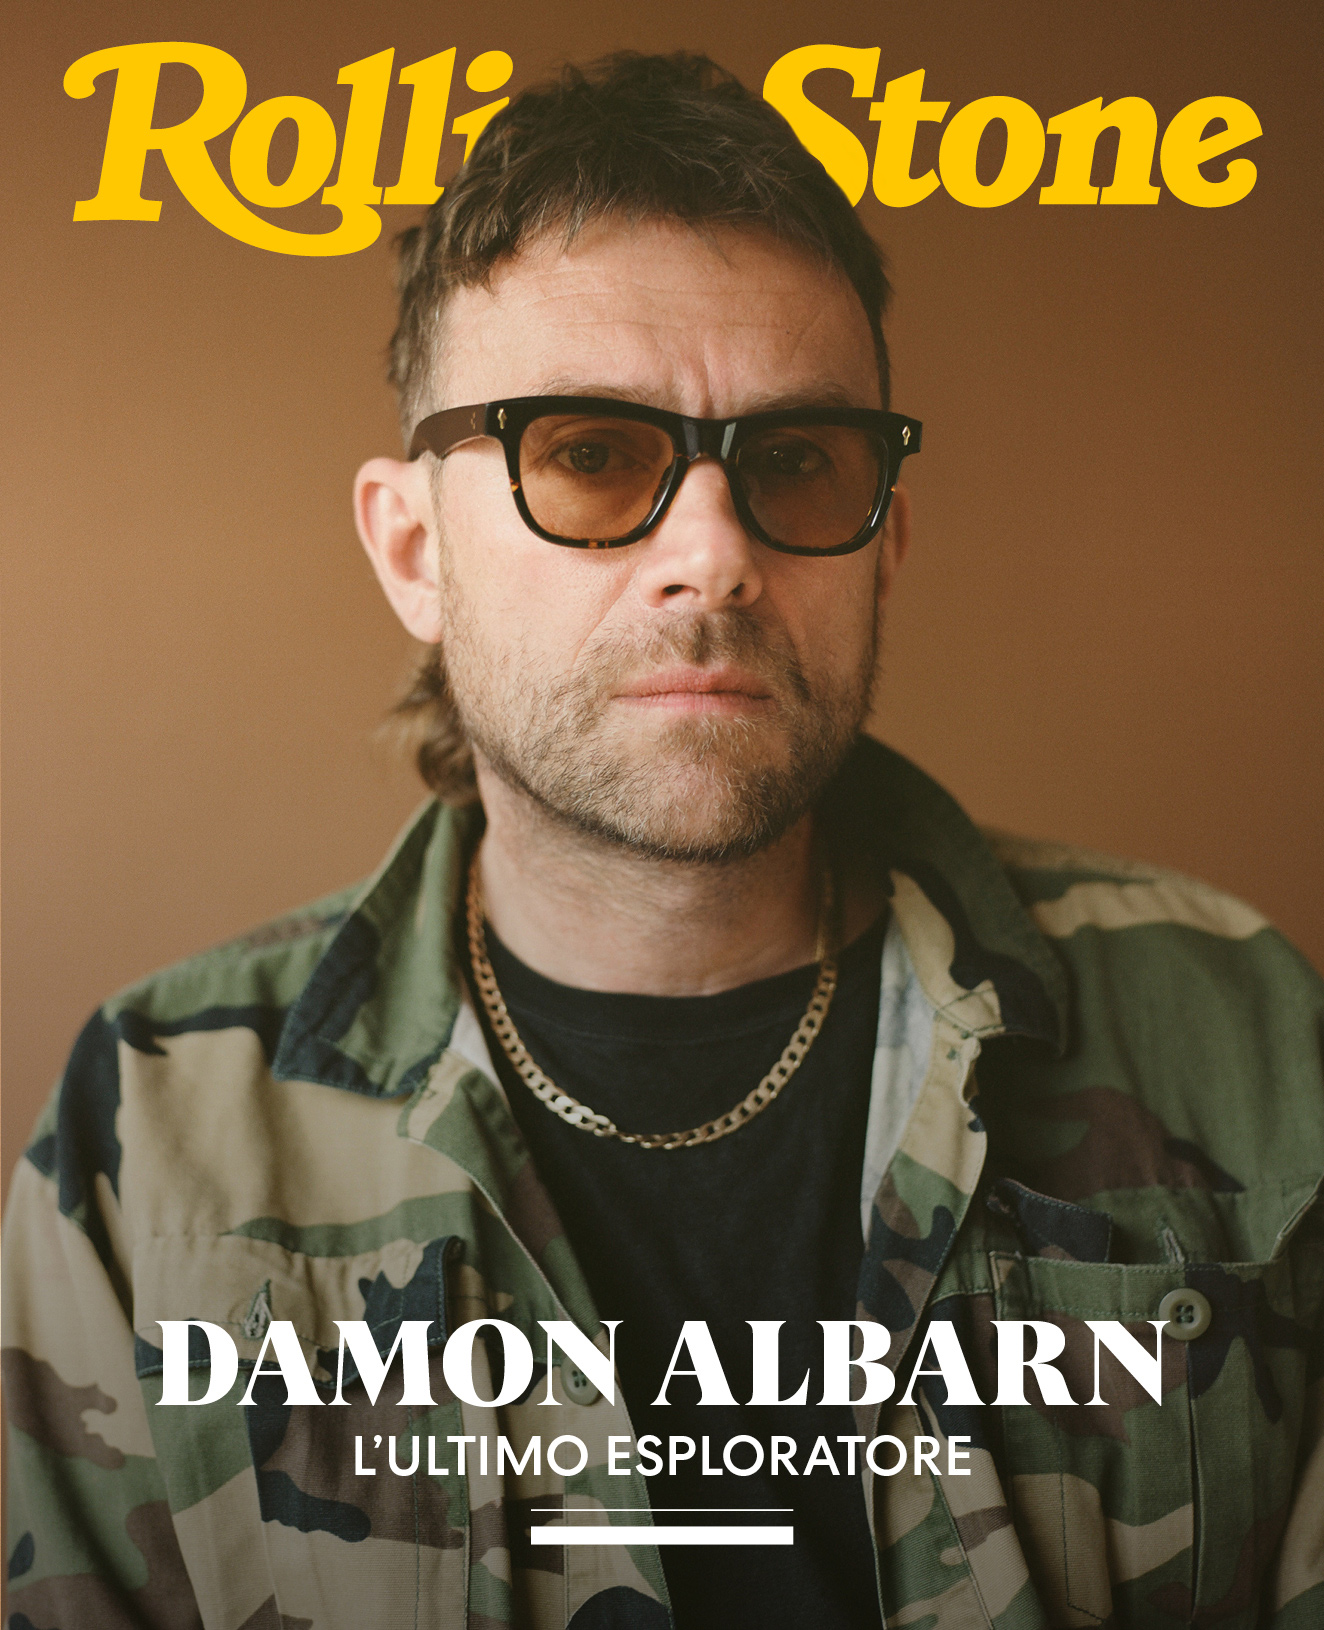 Damon Albarn cover rolling stone